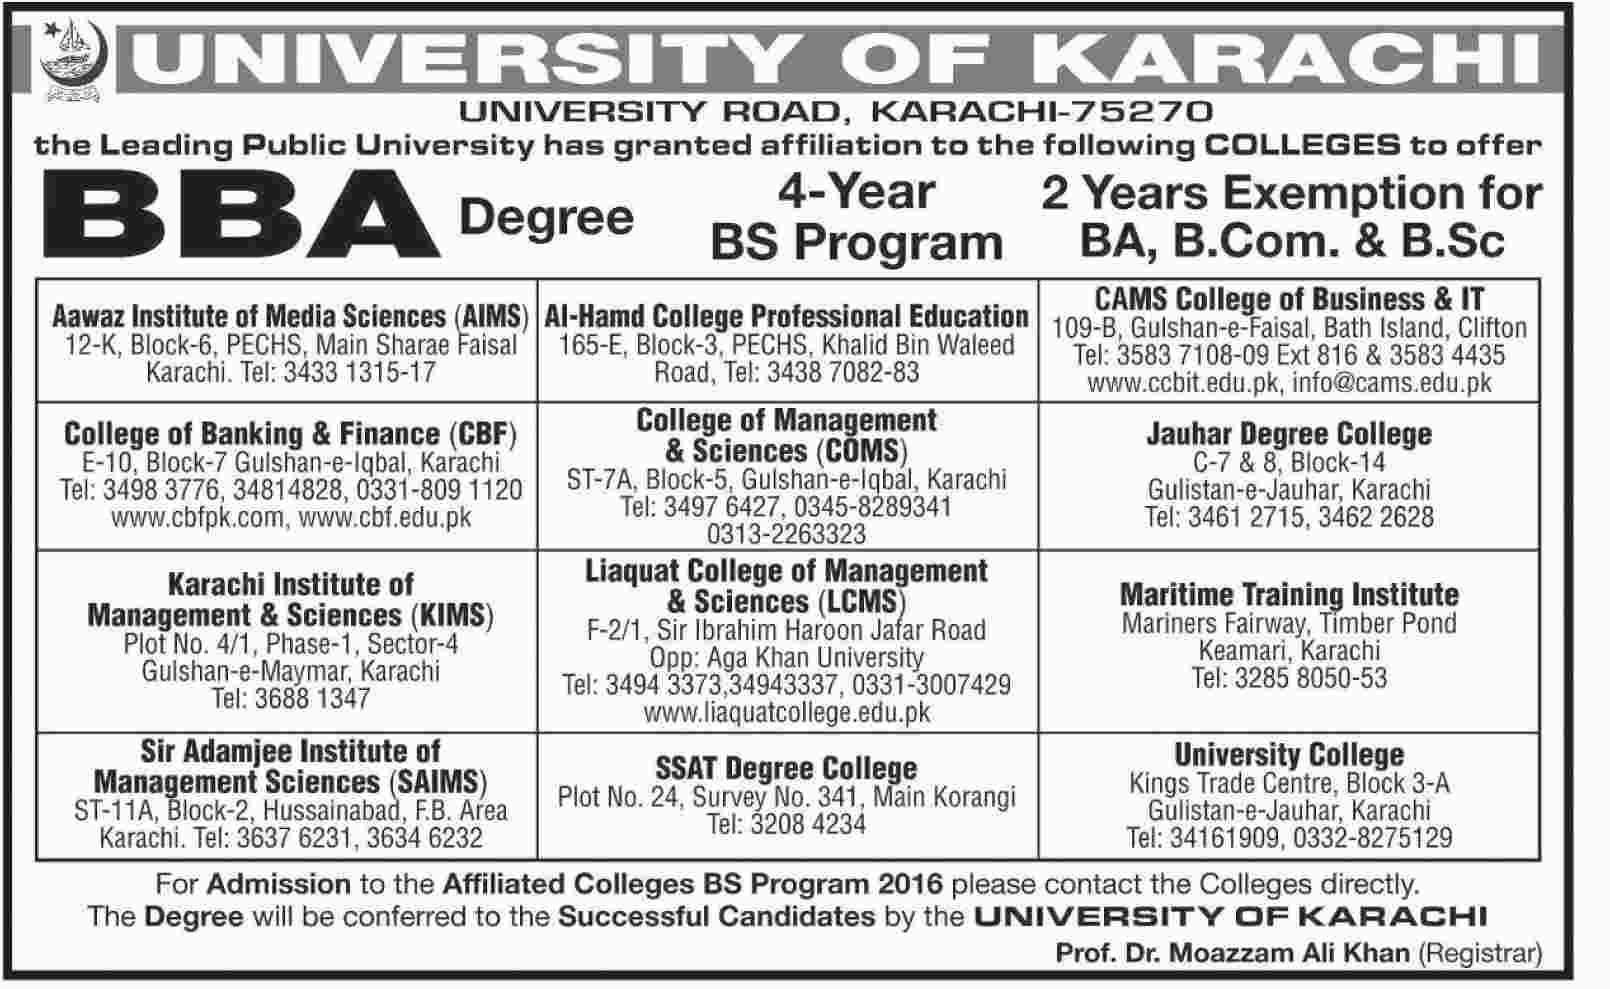 KARACHI: MBBS admissions begin at govt colleges - Newspaper - blogger.com